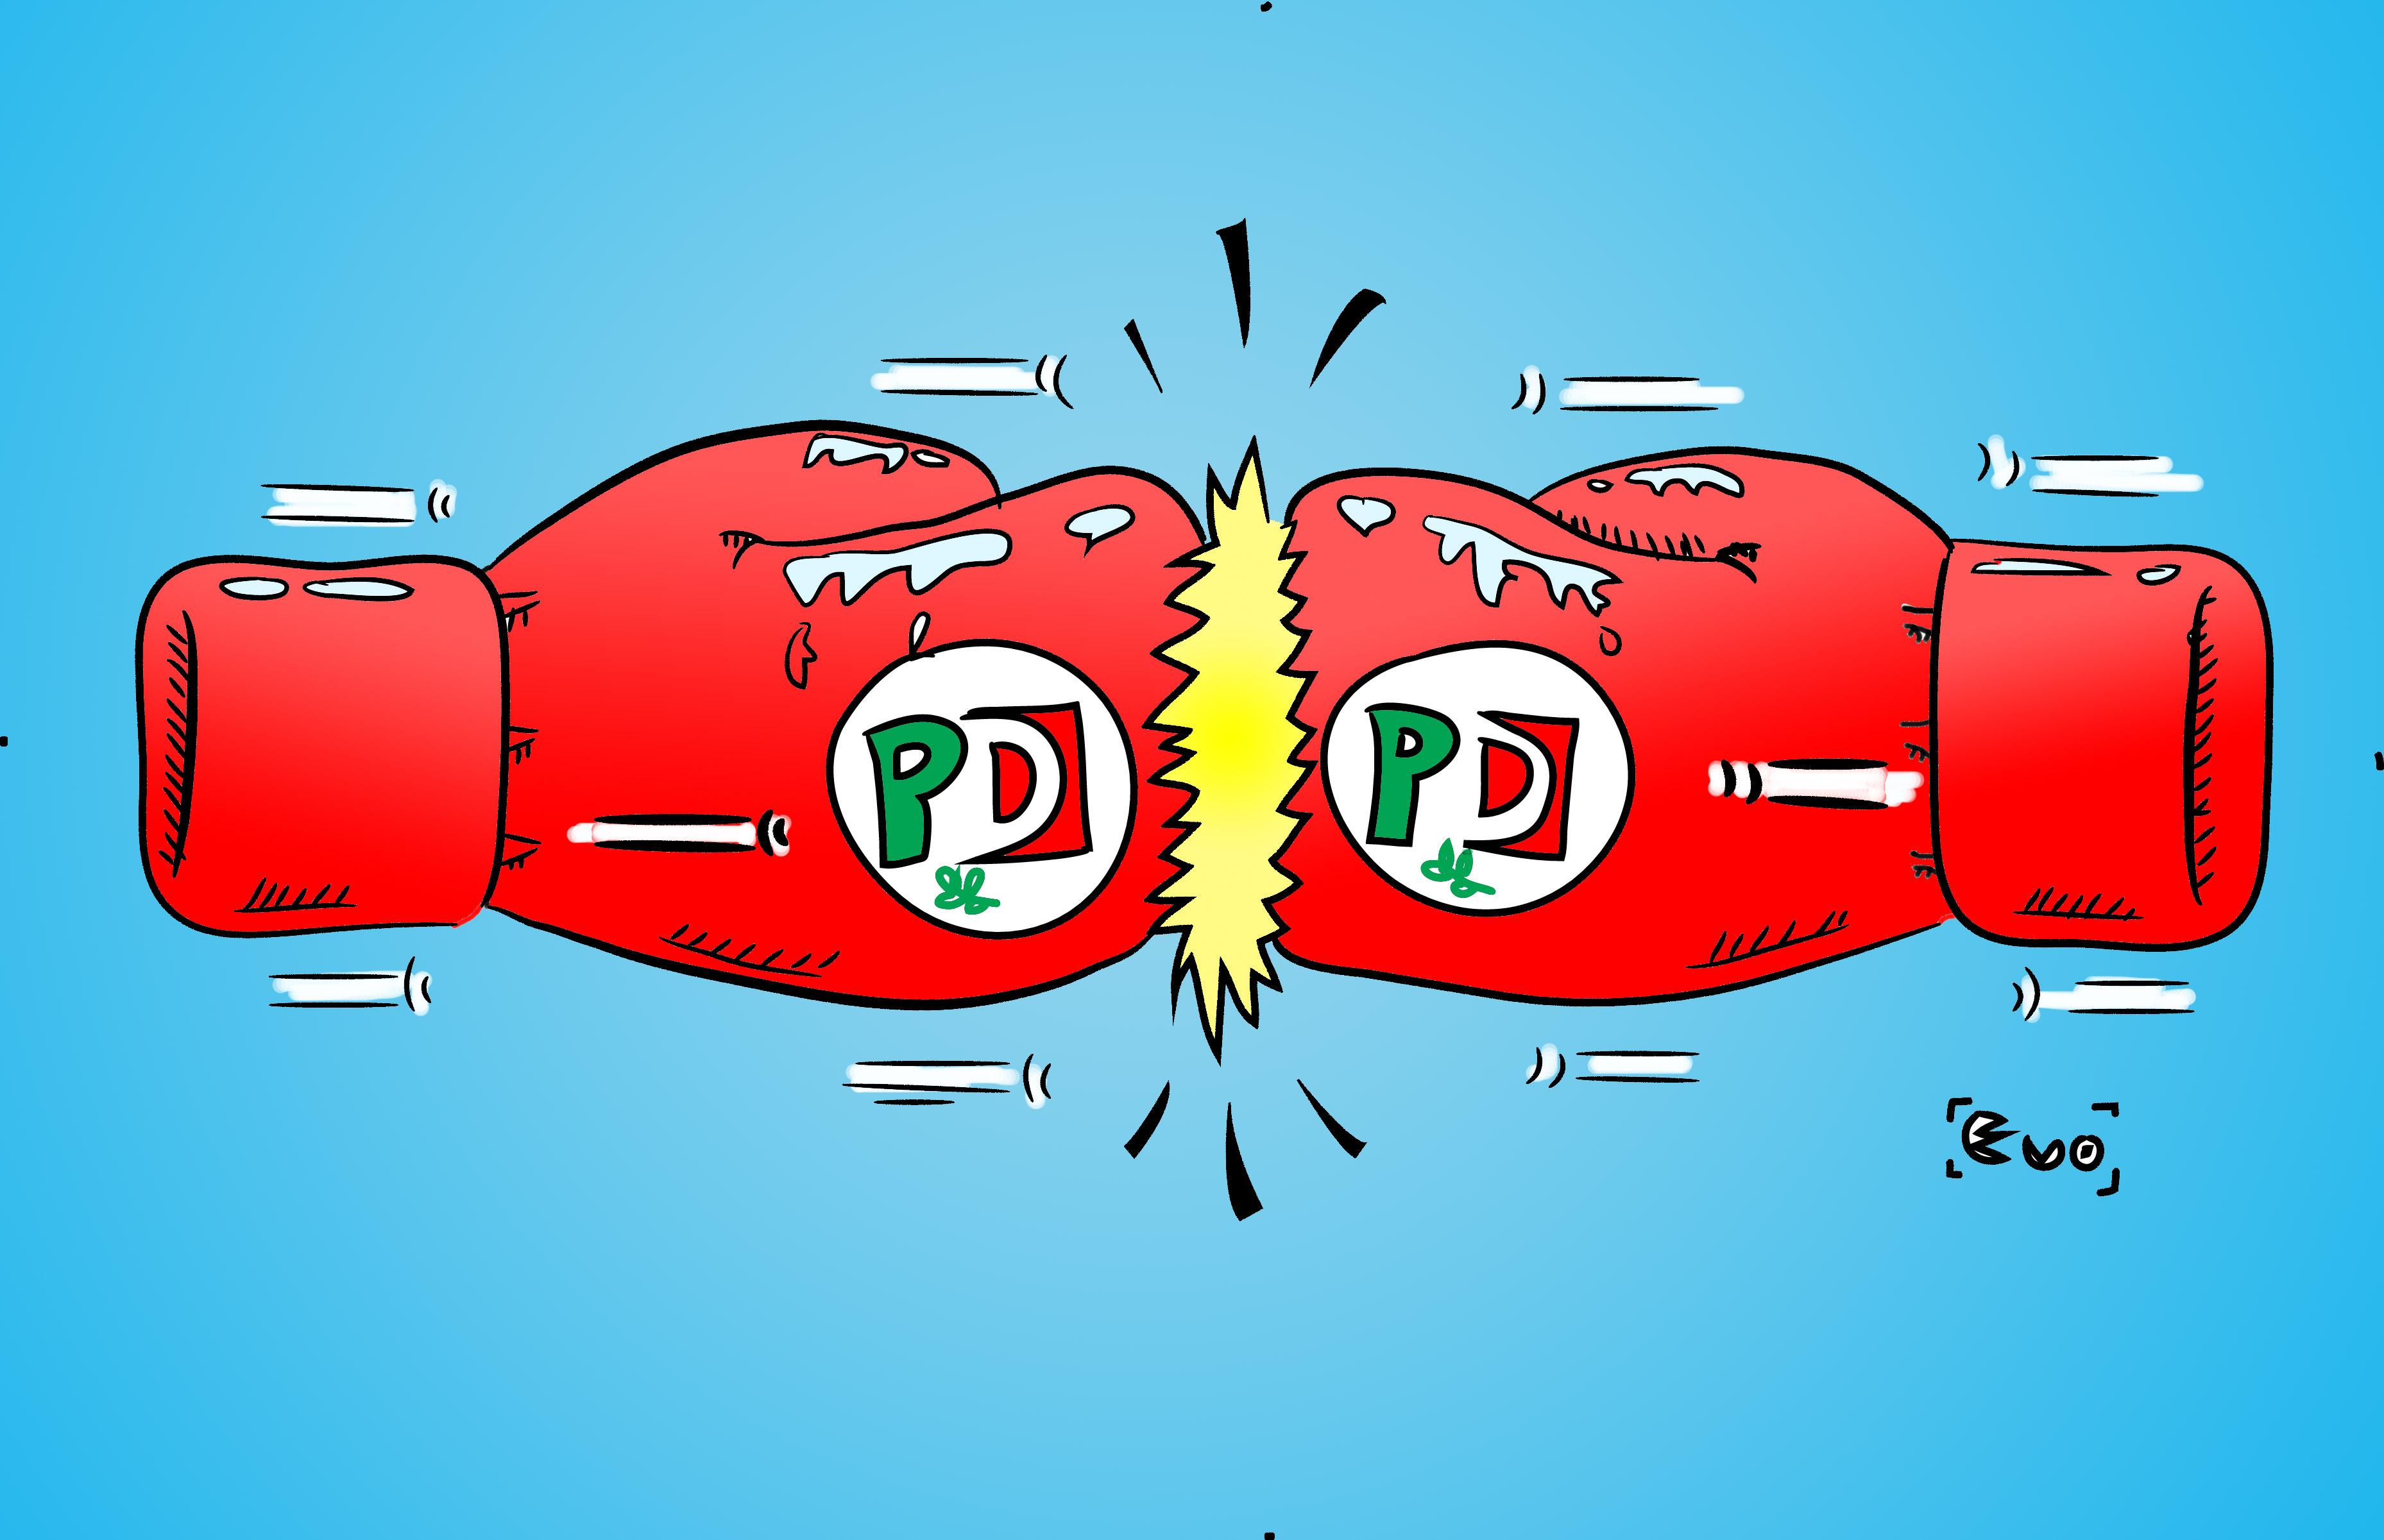 Pd versus Pd